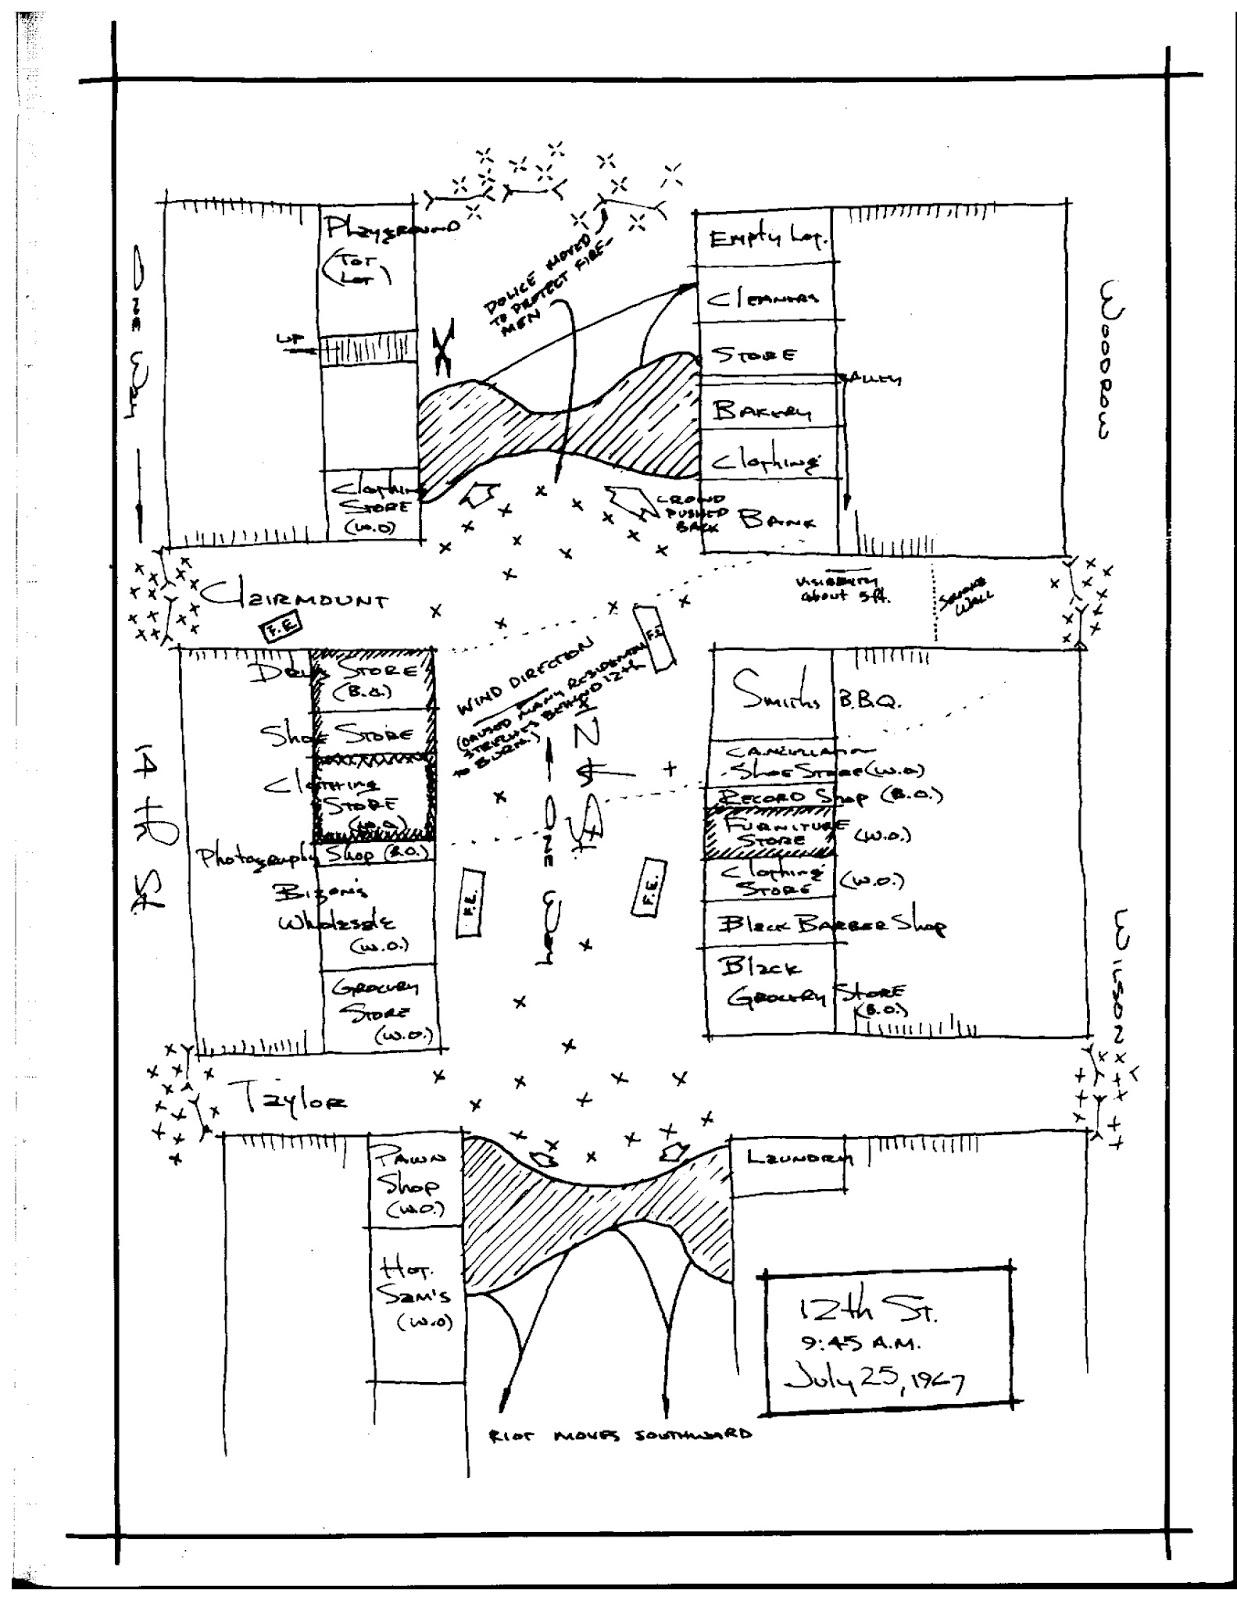 City Street Map Chicago Neighborhoods | Wiring Diagram Database on